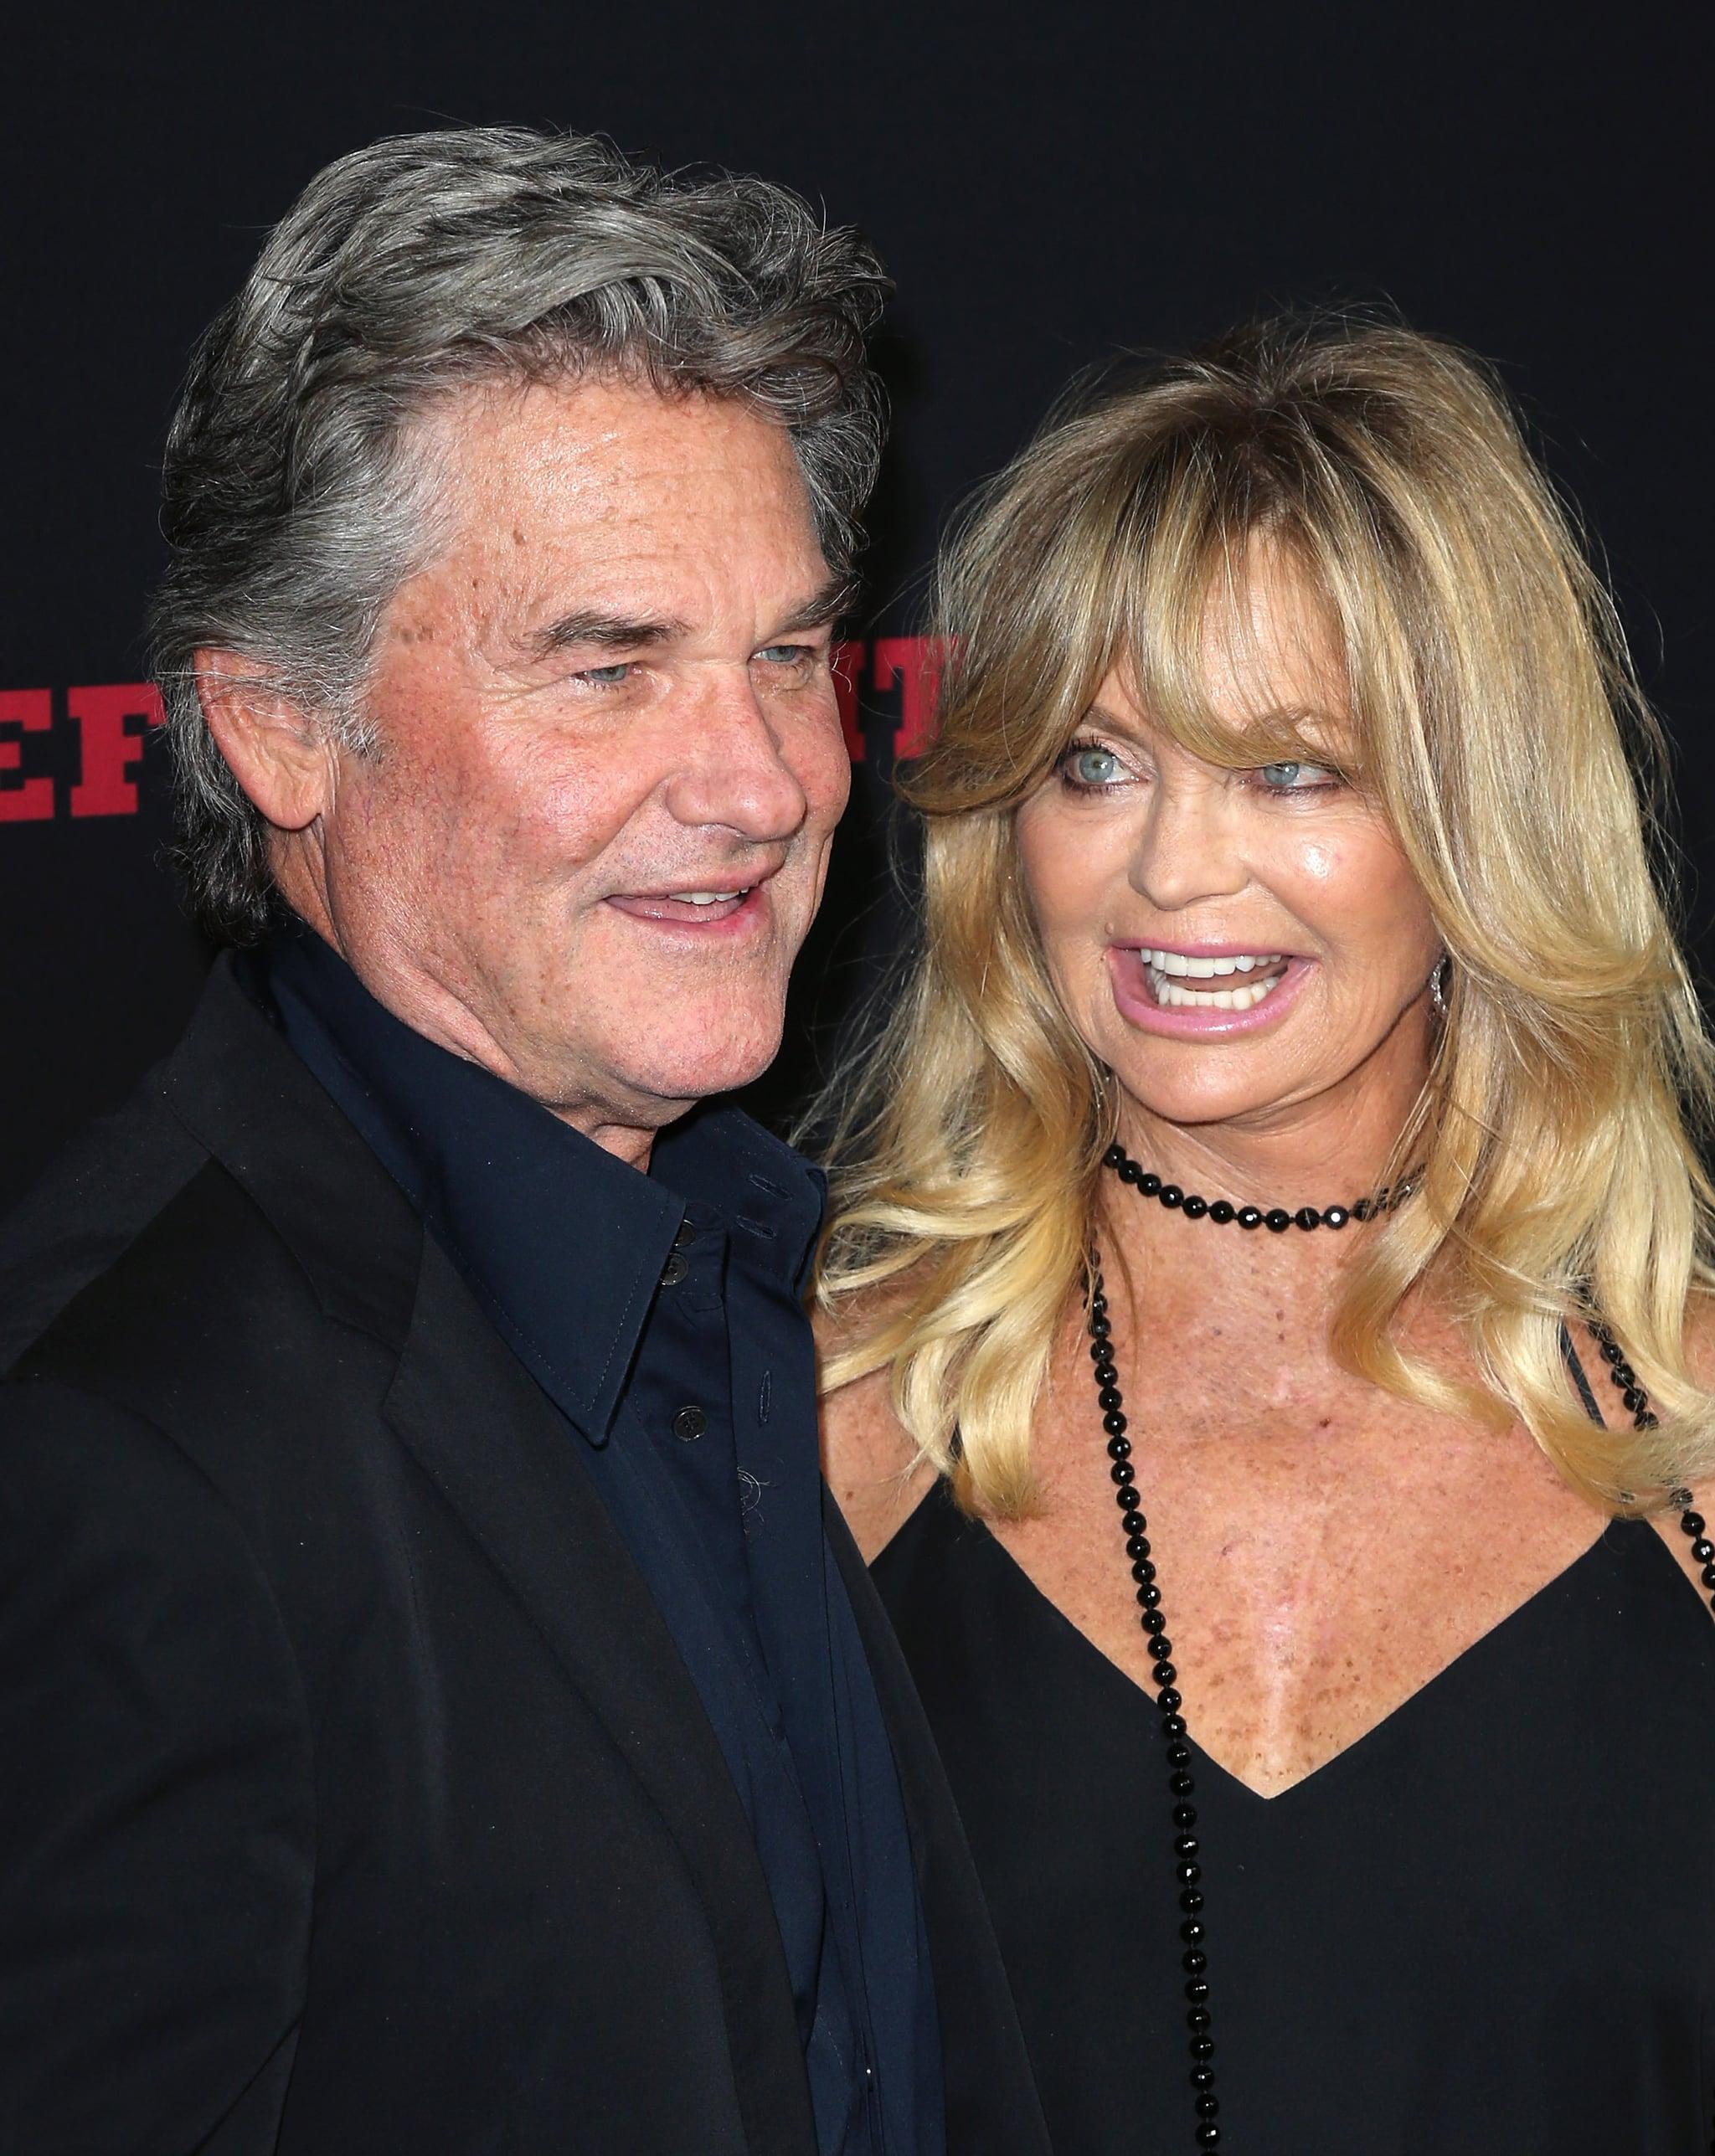 Kurt Russell And Goldie Hawn On Hateful Eight Red Carpet Popsugar Celebrity Uk